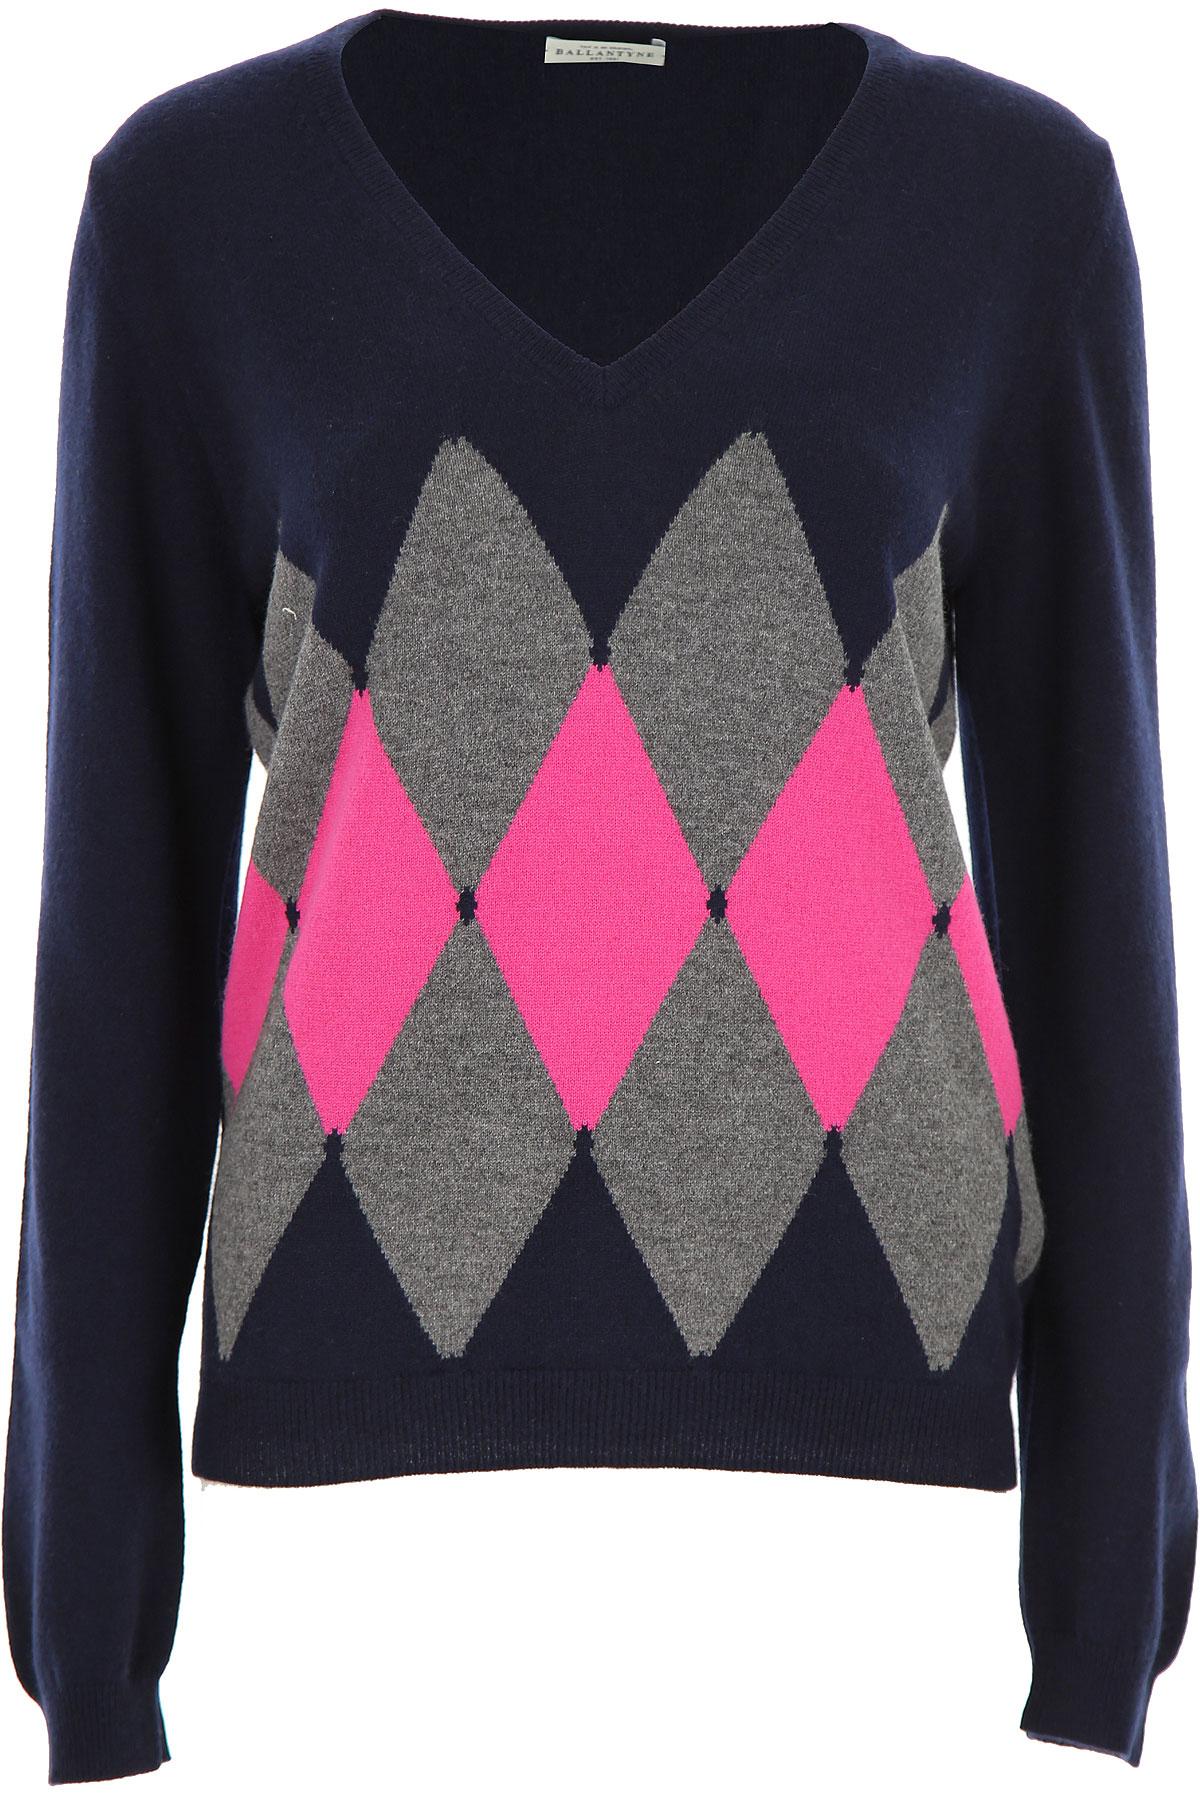 Ballantyne Sweater for Women Jumper On Sale, Navy Blue, Cashemere, 2019, 4 8